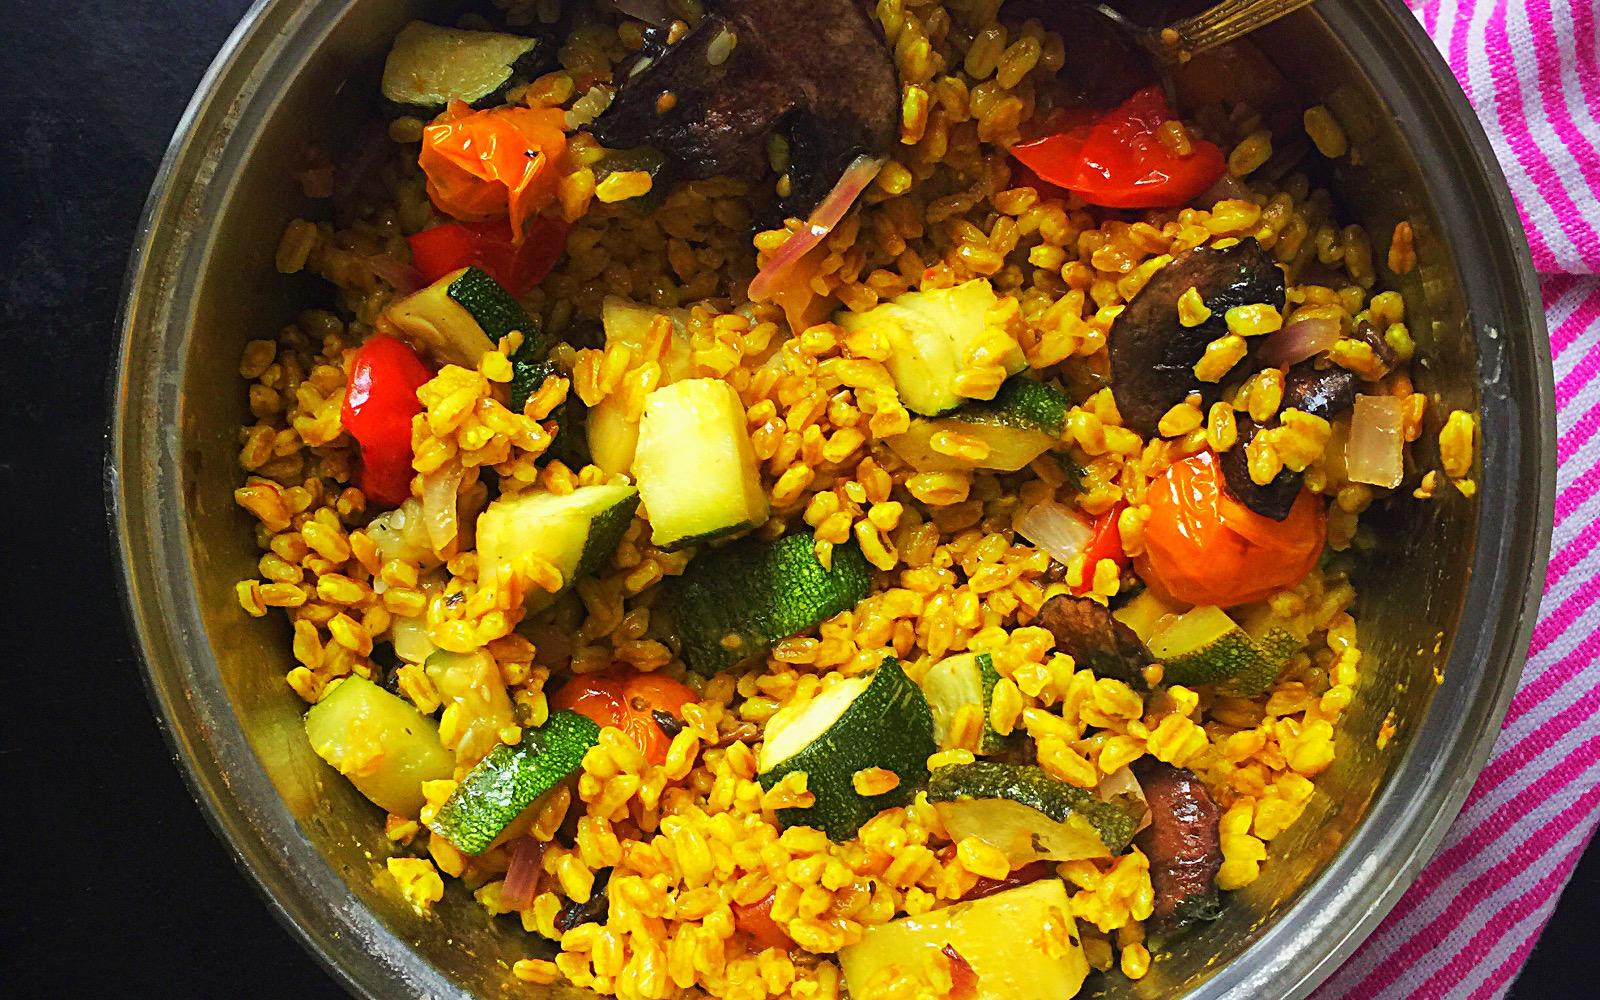 Vegan Turmeric Farro with Roasted Vegetables